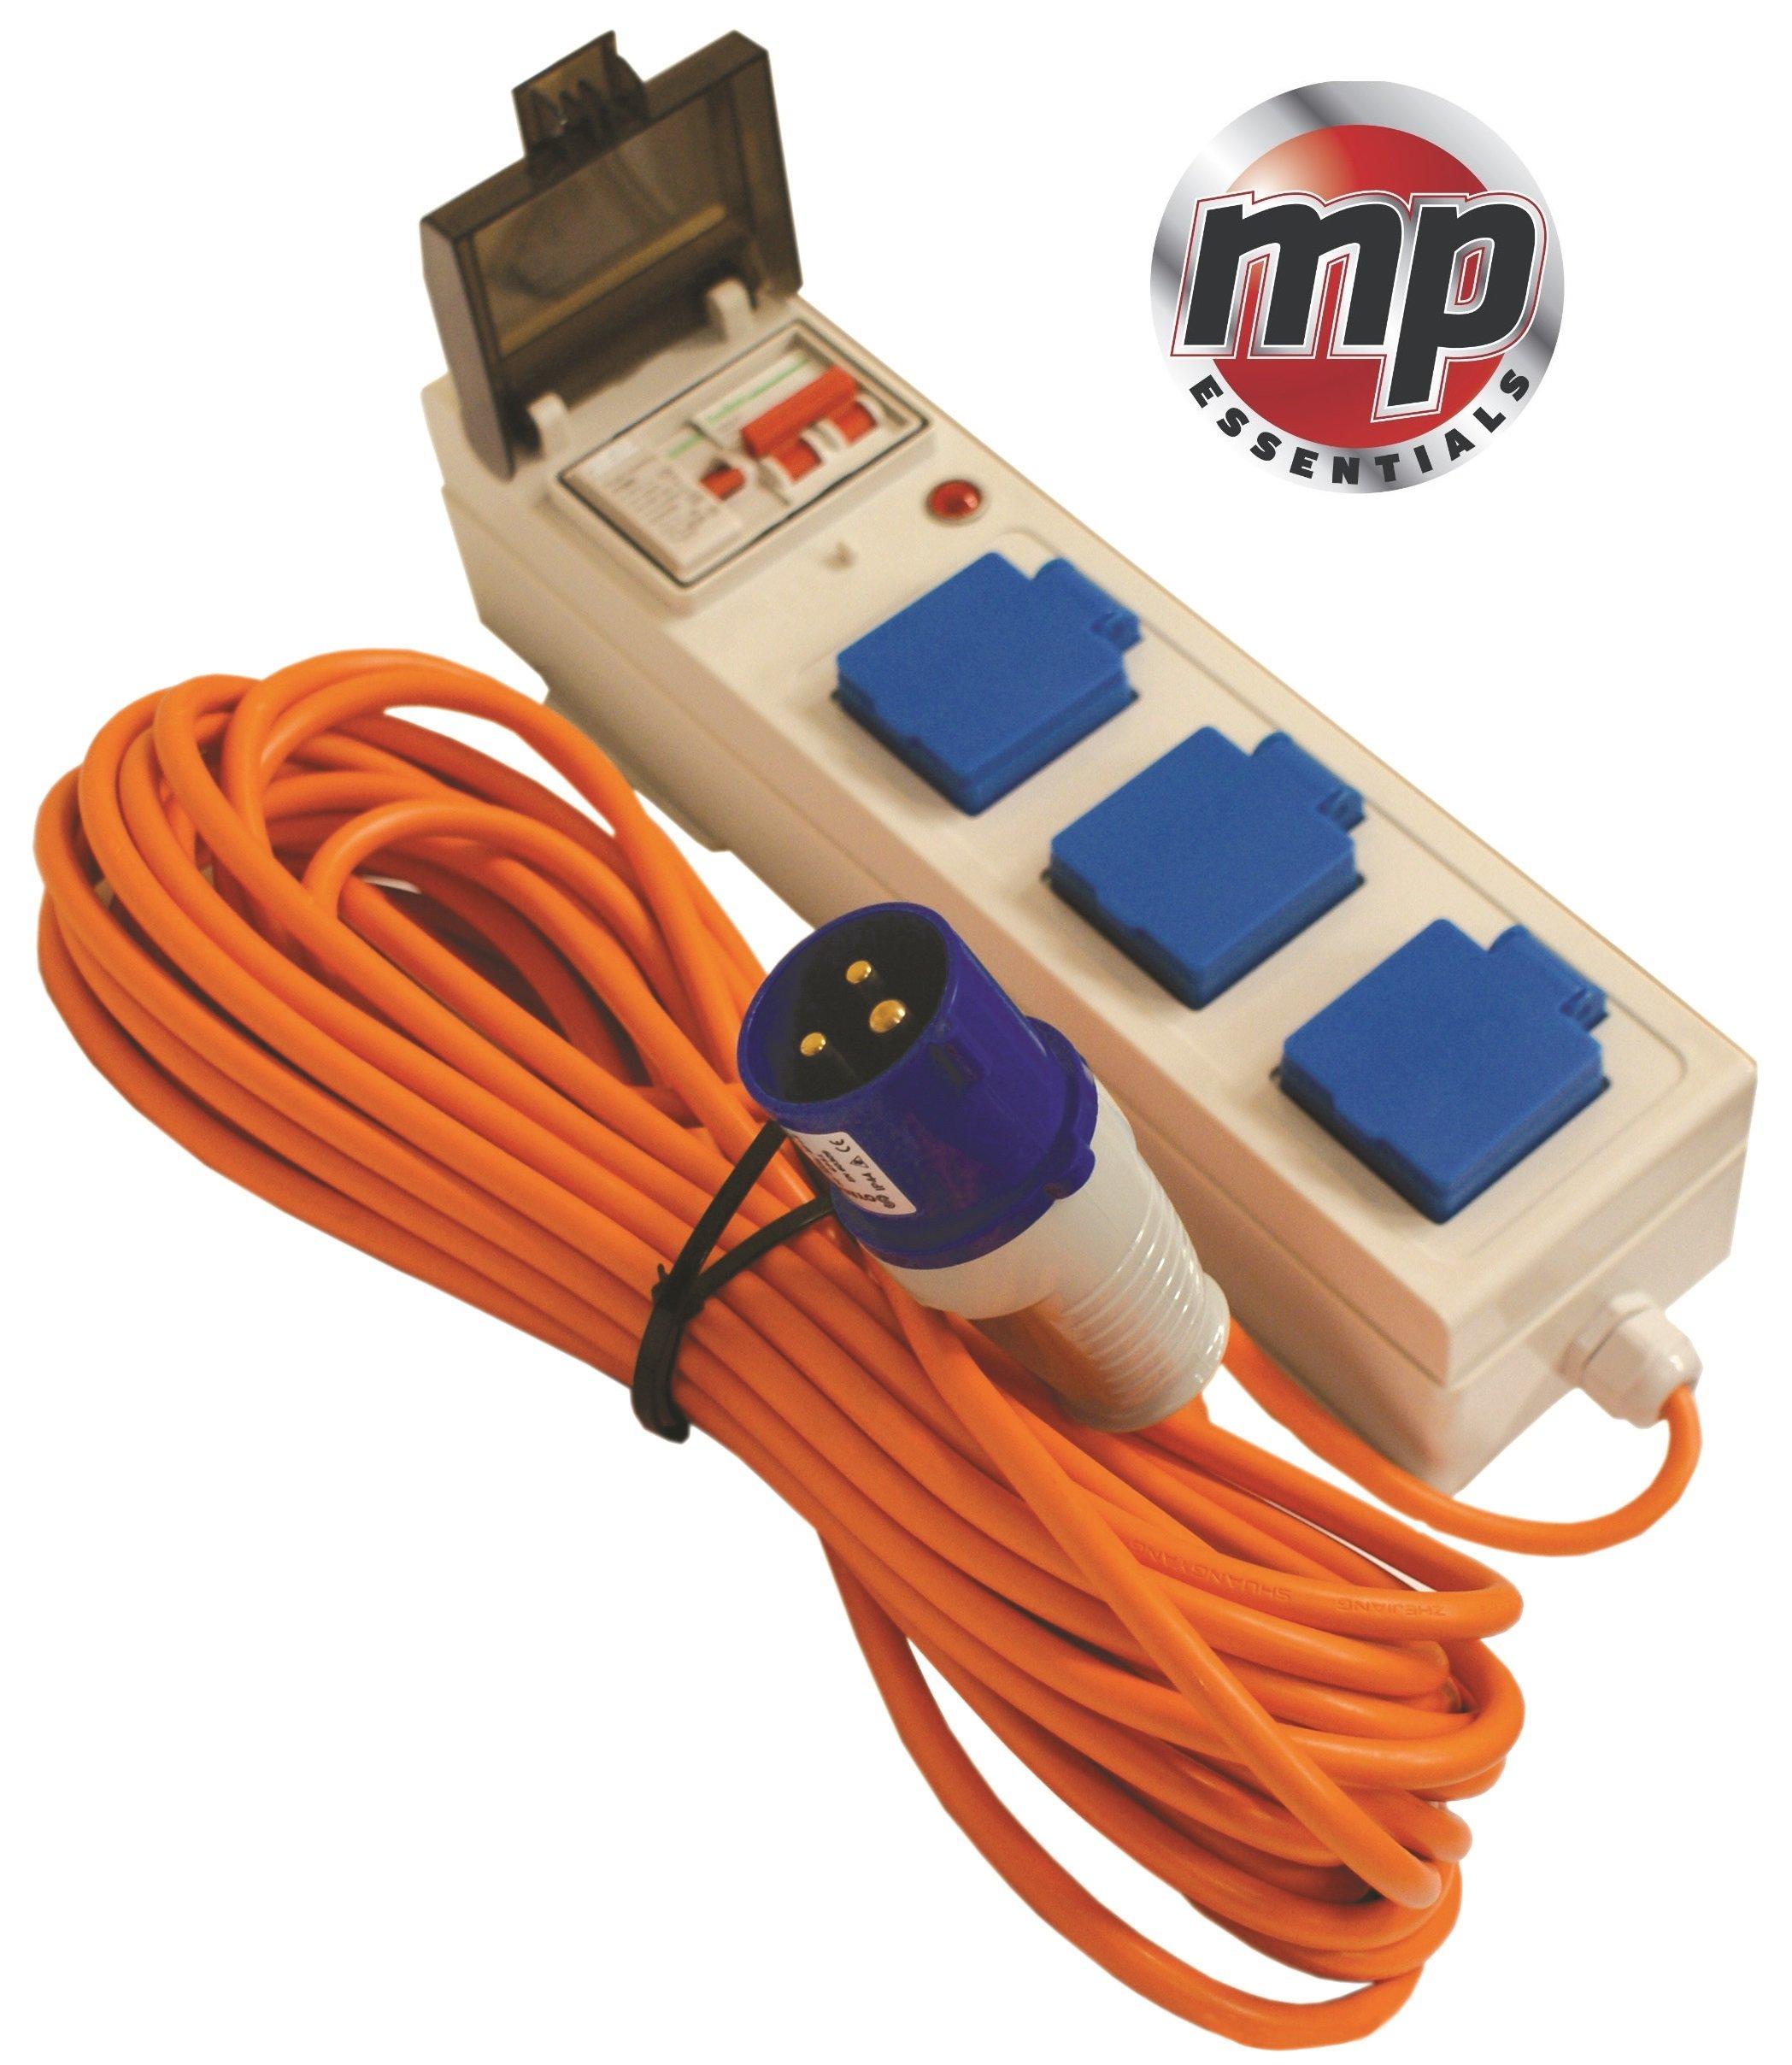 MP Essentials 3 Way Mobile Mains Unit Caravan Motorhome Campsite Power Hook Up RCD Cable Lead 1